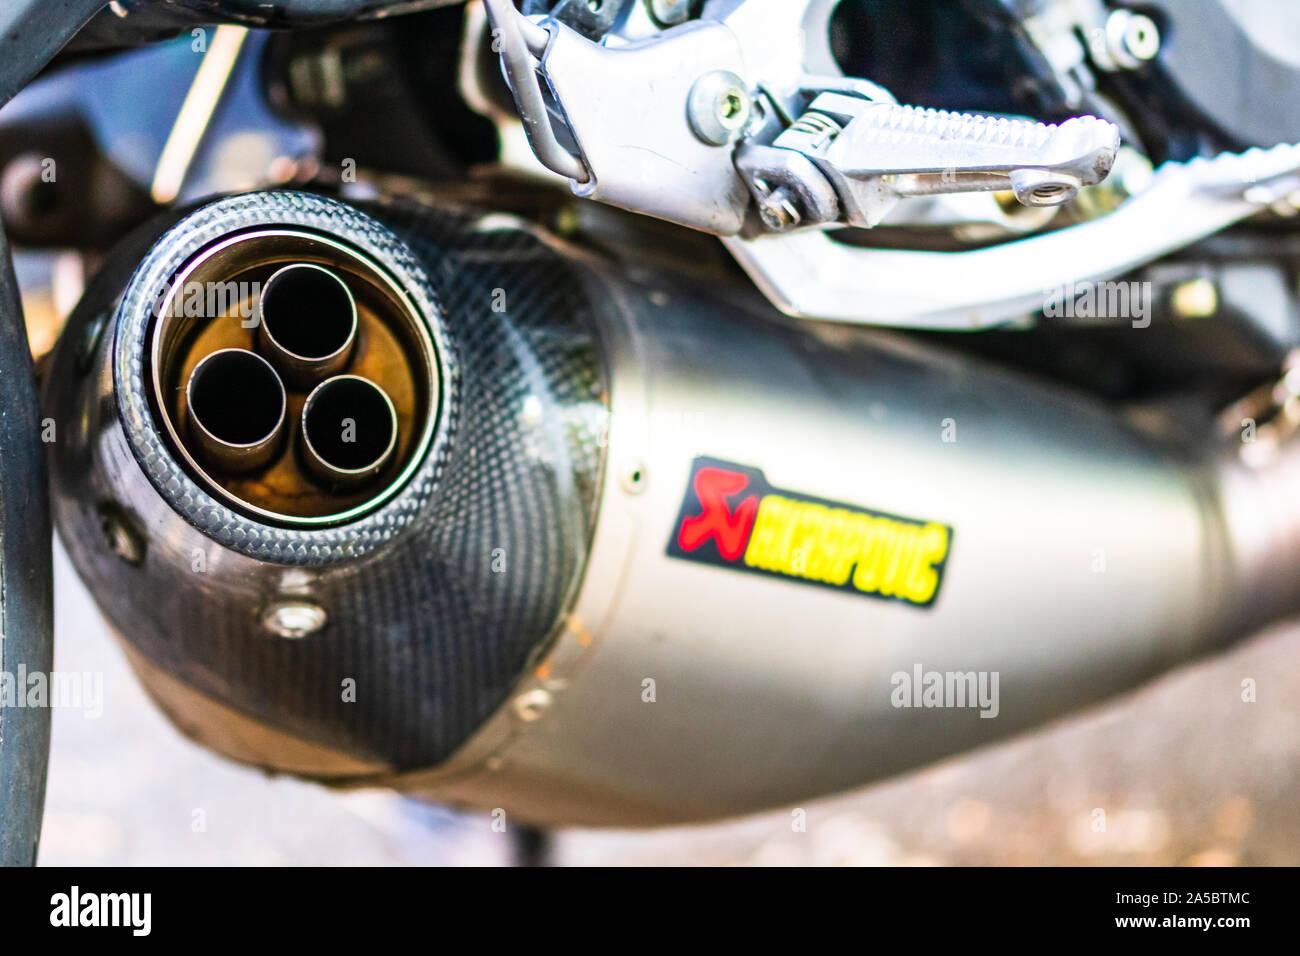 https www alamy com a close up photo of akrapovic exhaust muffler on custom motorcycle in bucharest romania 2019 image330331132 html